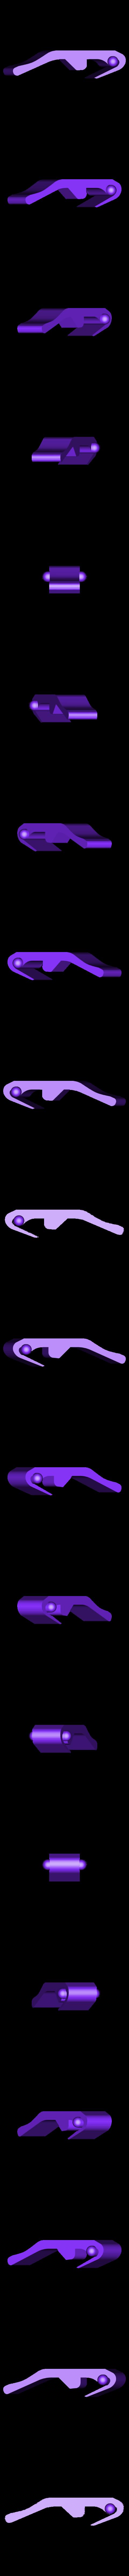 TRIGG.stl Download STL file Gaming Grip for Smartphones • 3D printing template, SOLIDMaker3D